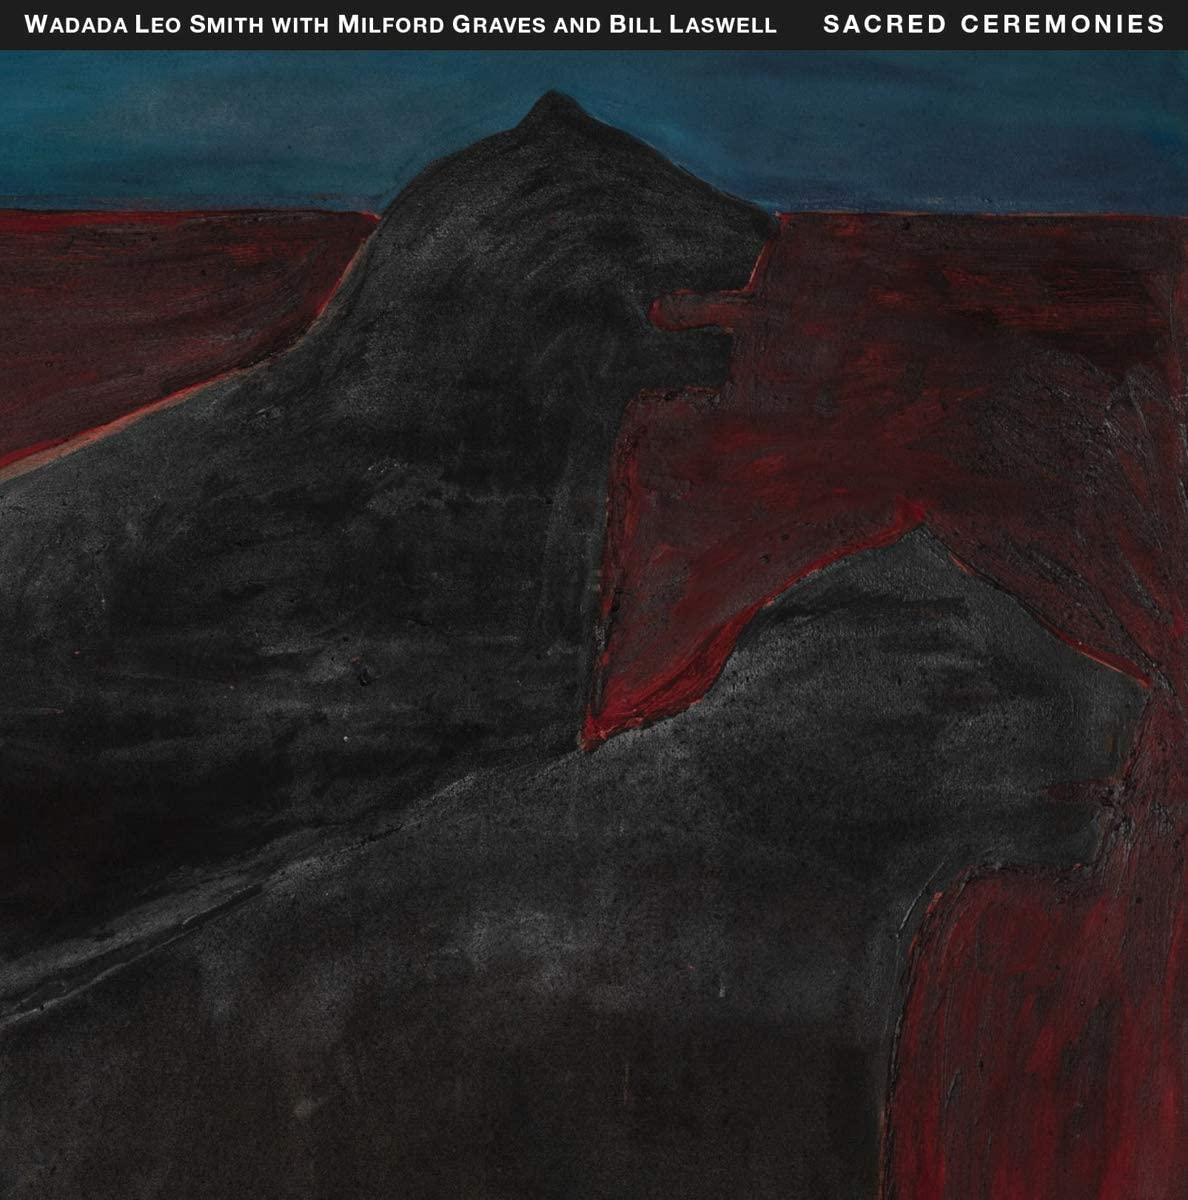 WADADA LEO SMITH - Sacred Ceremonies cover